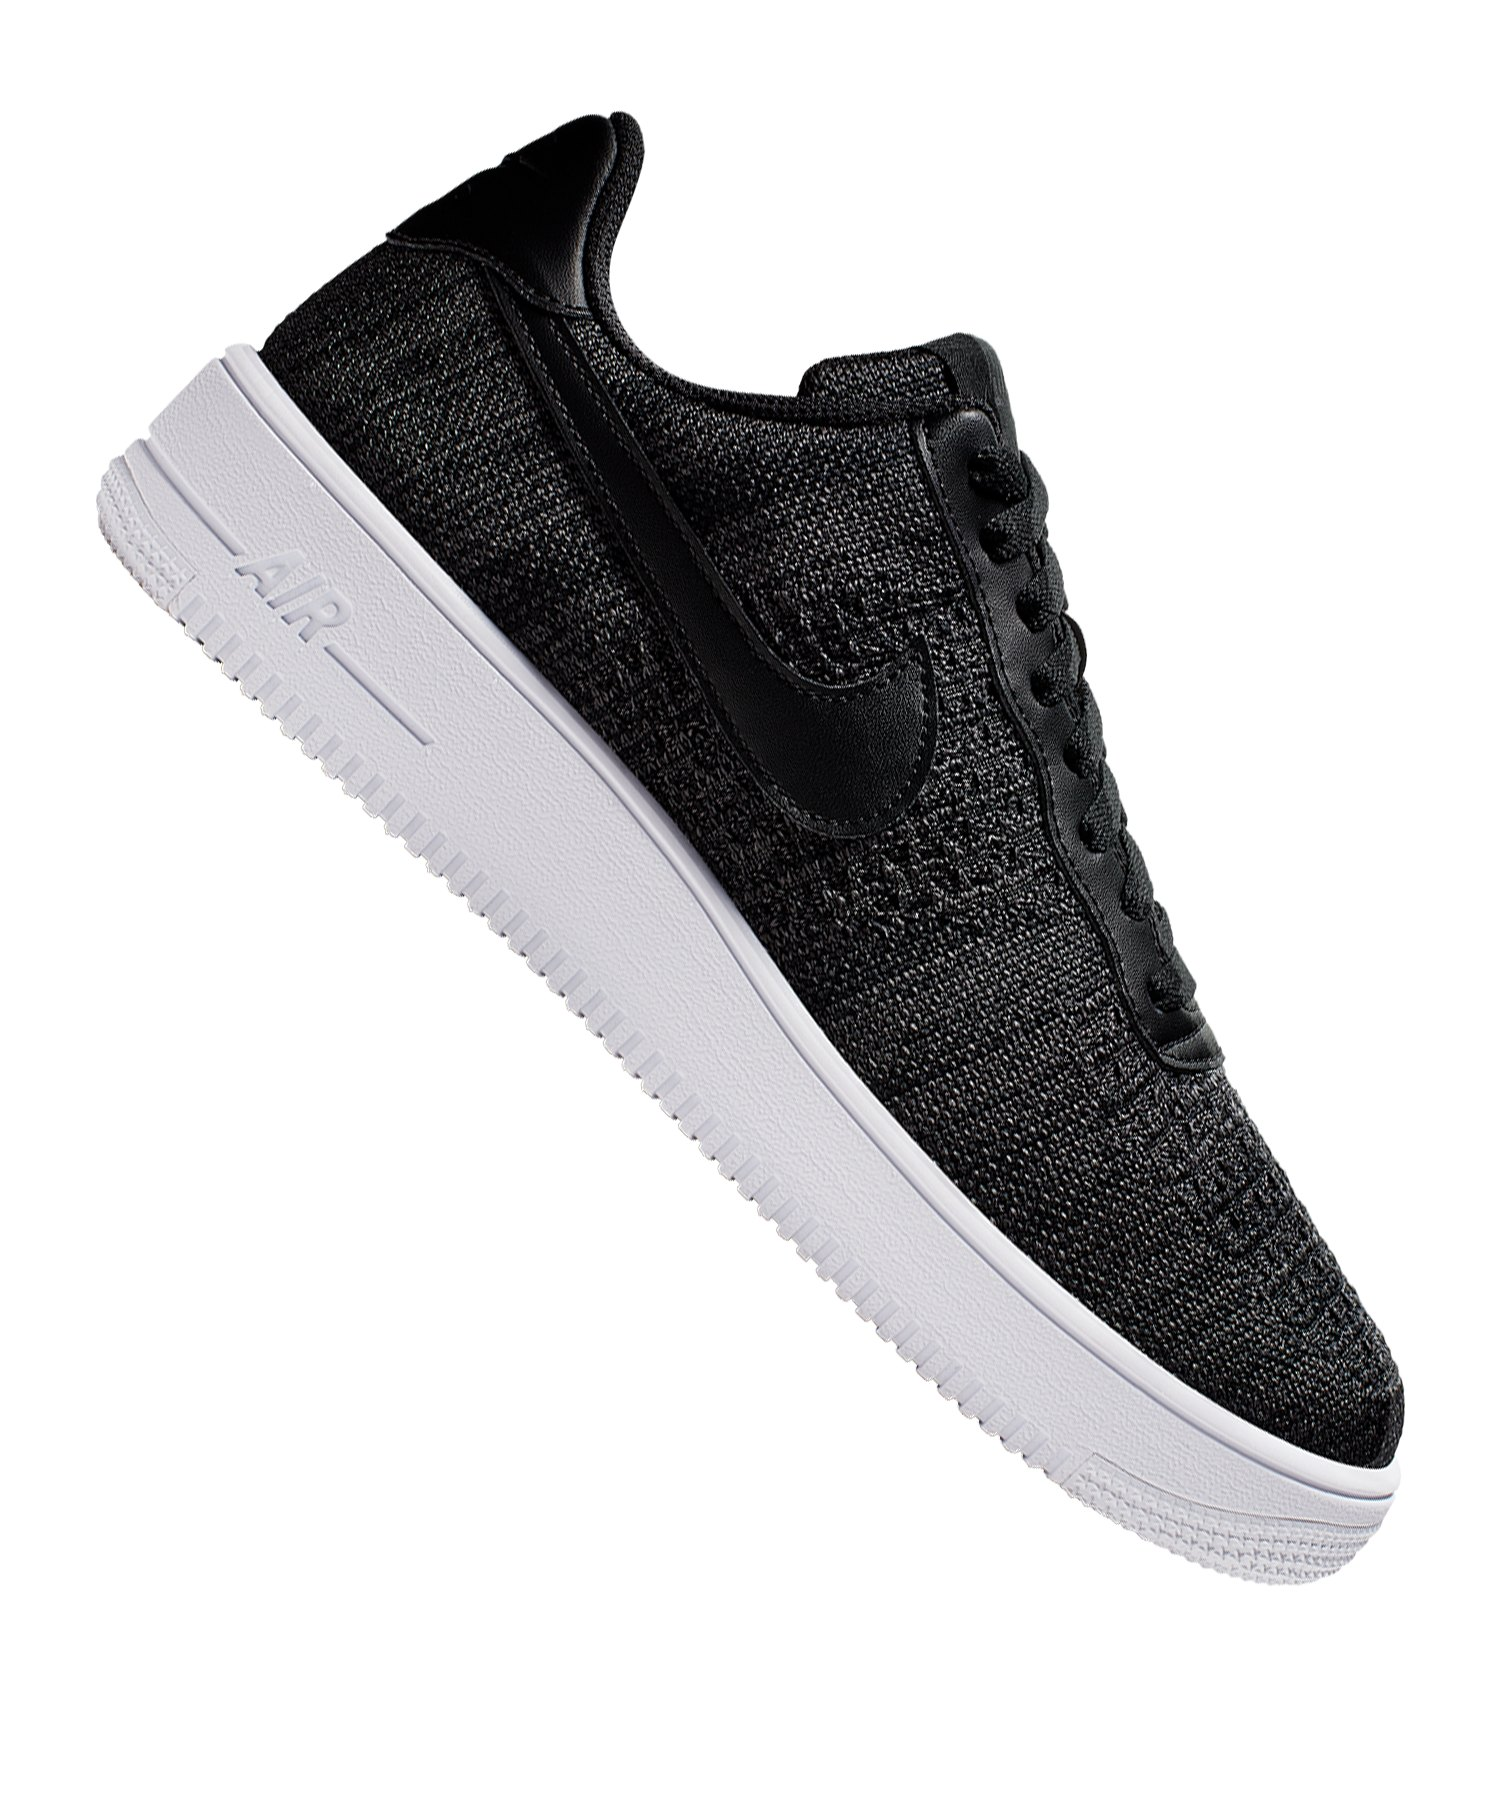 Nike Air Force Flyknit schwarz